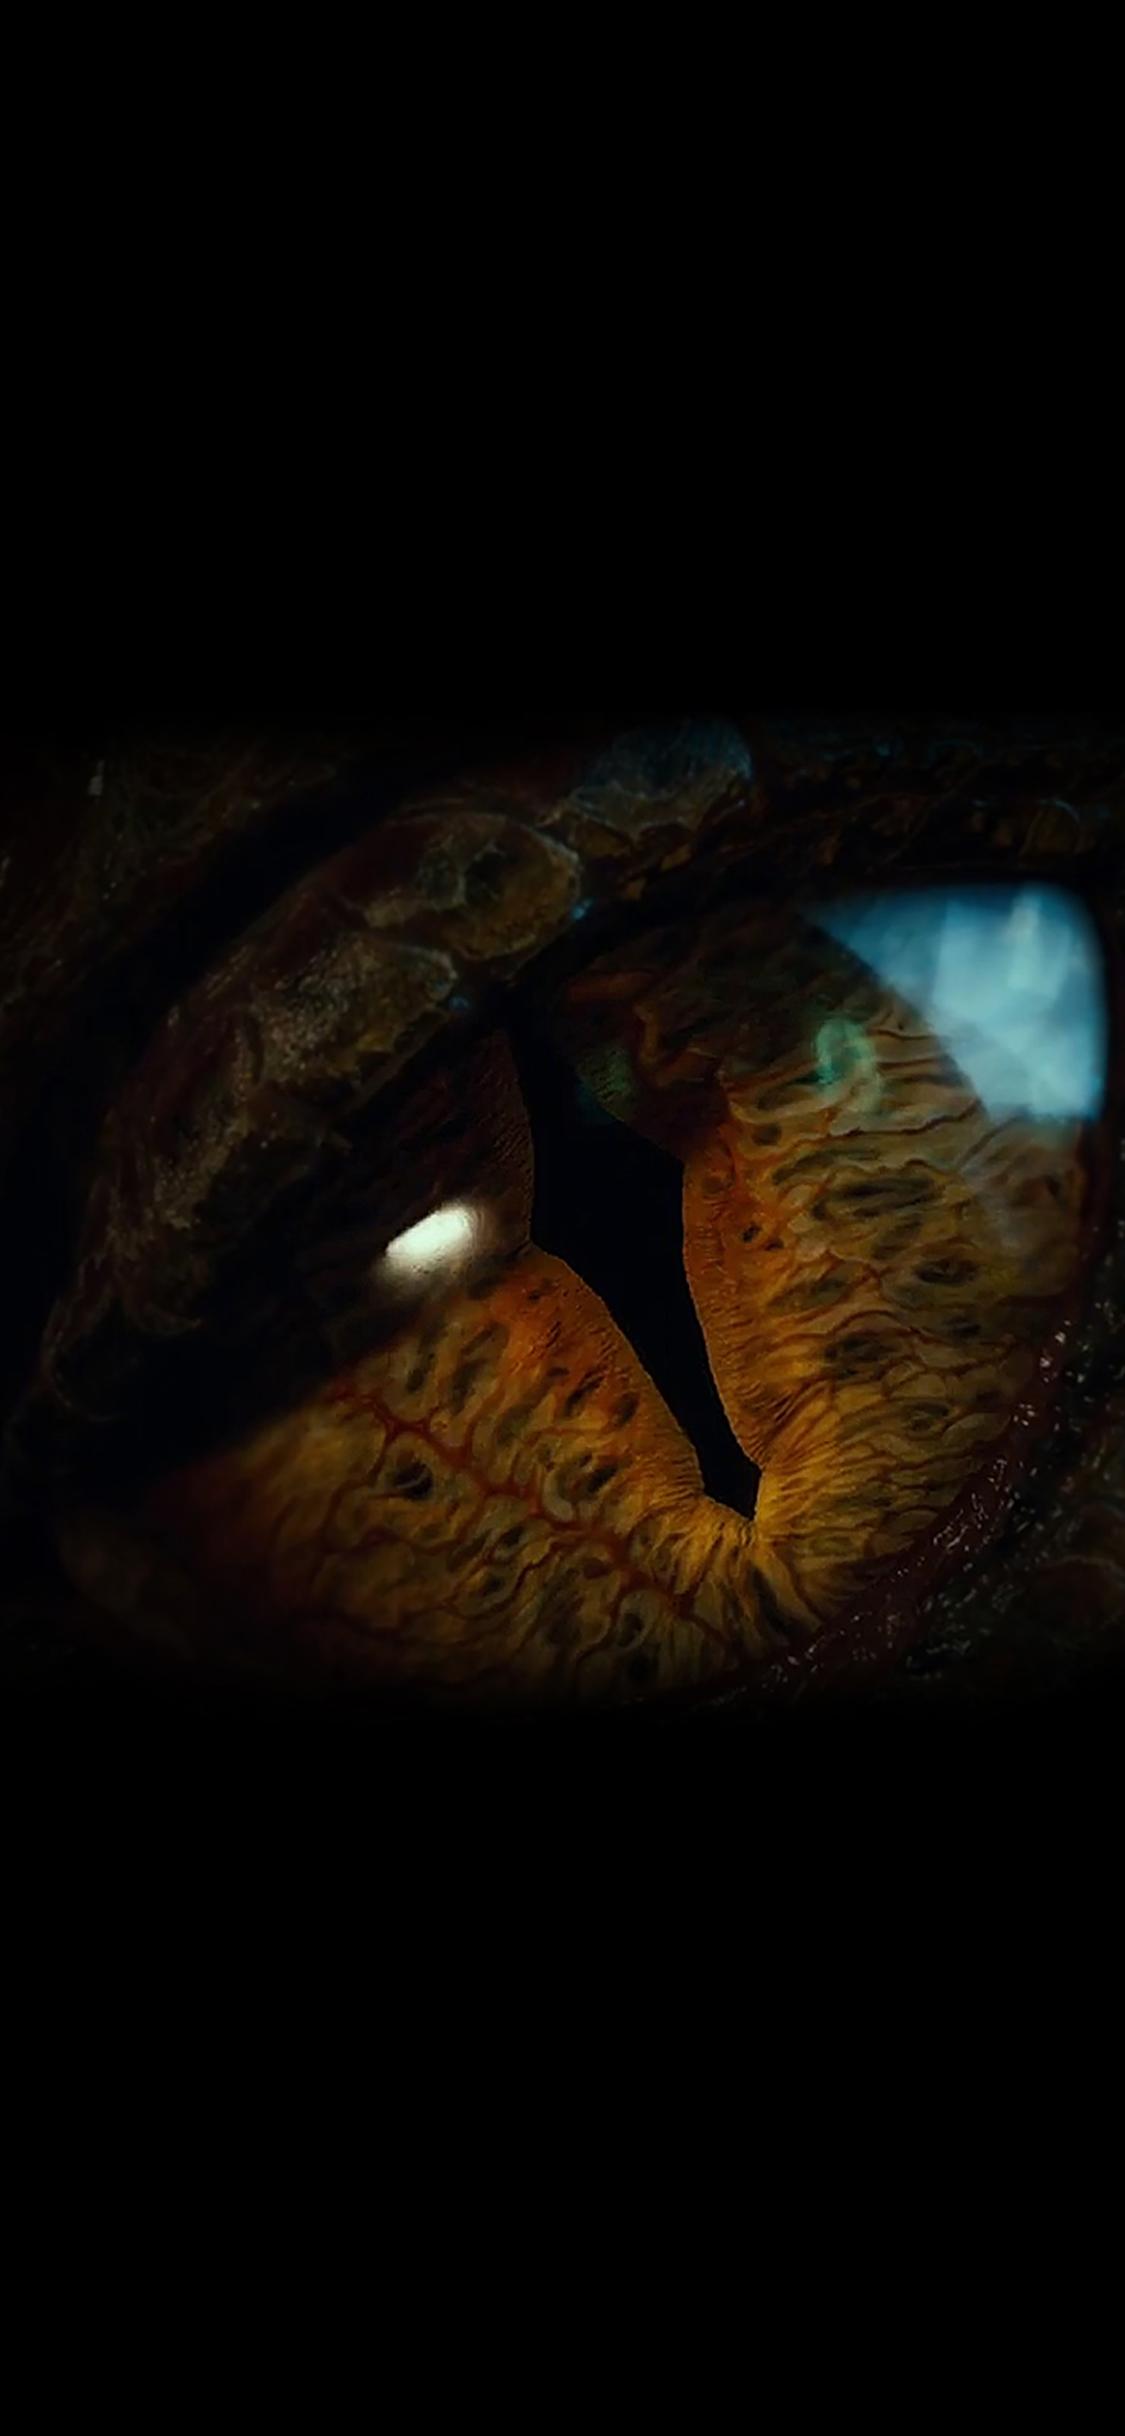 iPhoneXpapers.com-Apple-iPhone-wallpaper-ah32-eye-dragon-hobbit-the-battle-five-armies-art-dark